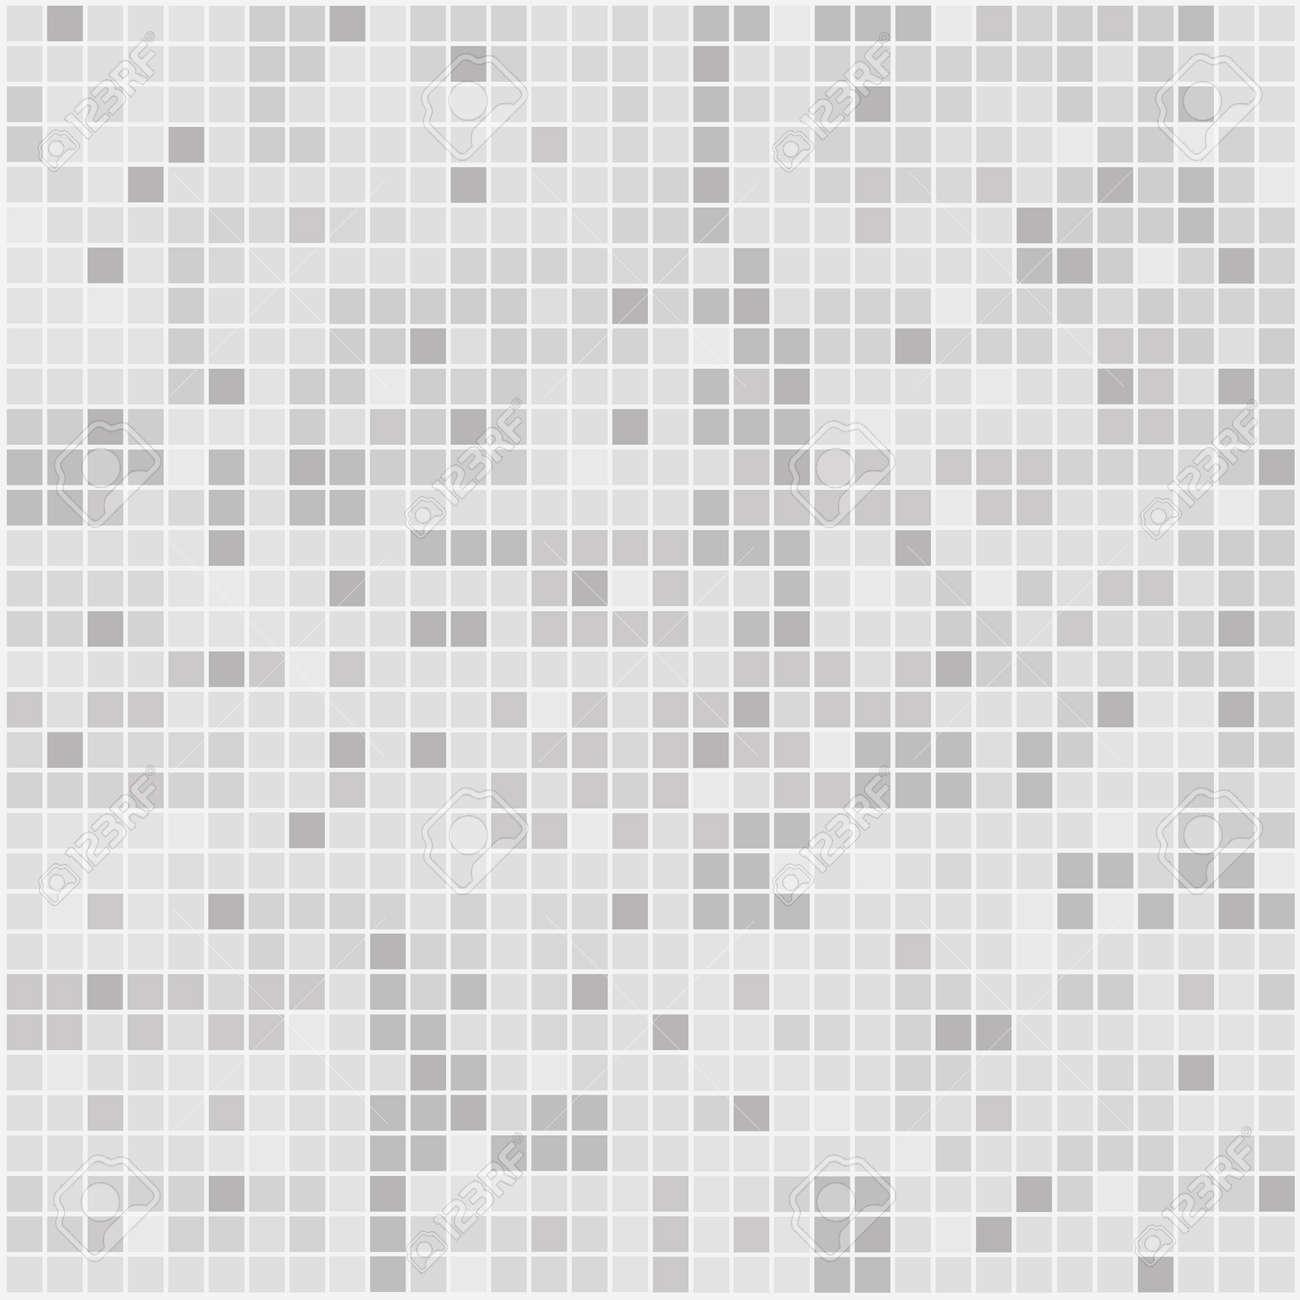 Pattern Mosaic Tiles Texture Stock Vector